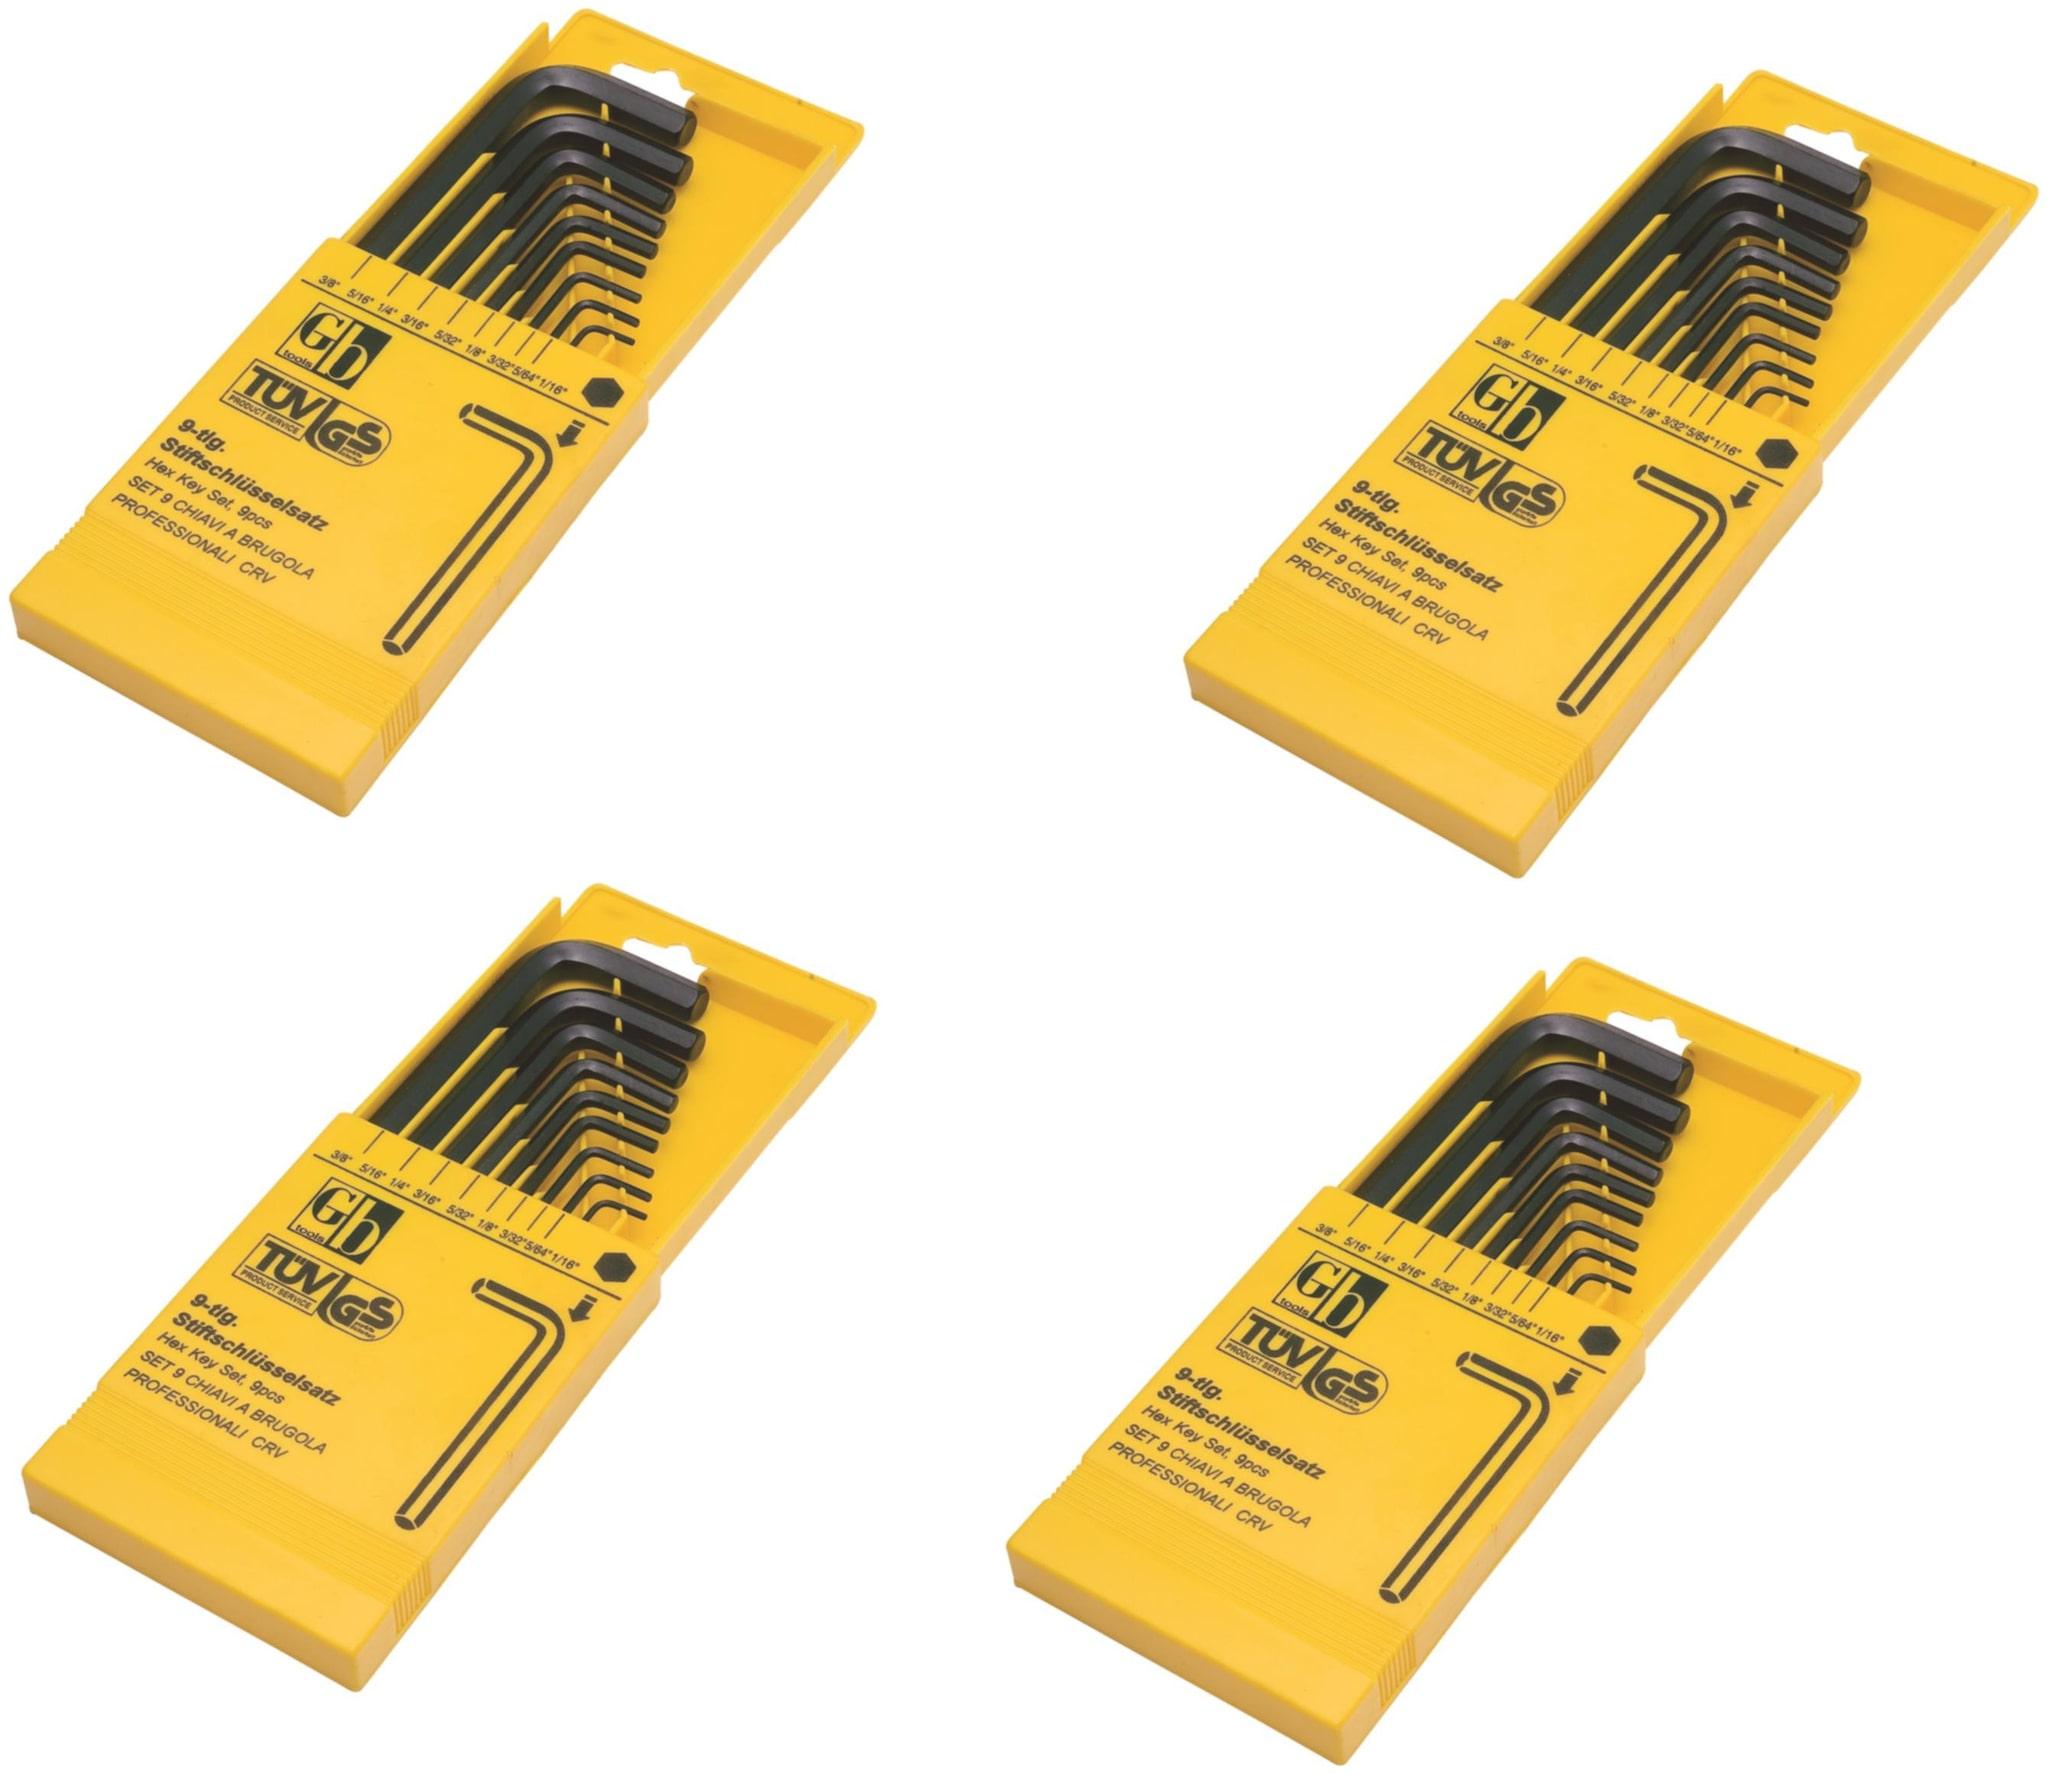 GB Tools   Hex Allen Key Sets   Pack of 4 sets